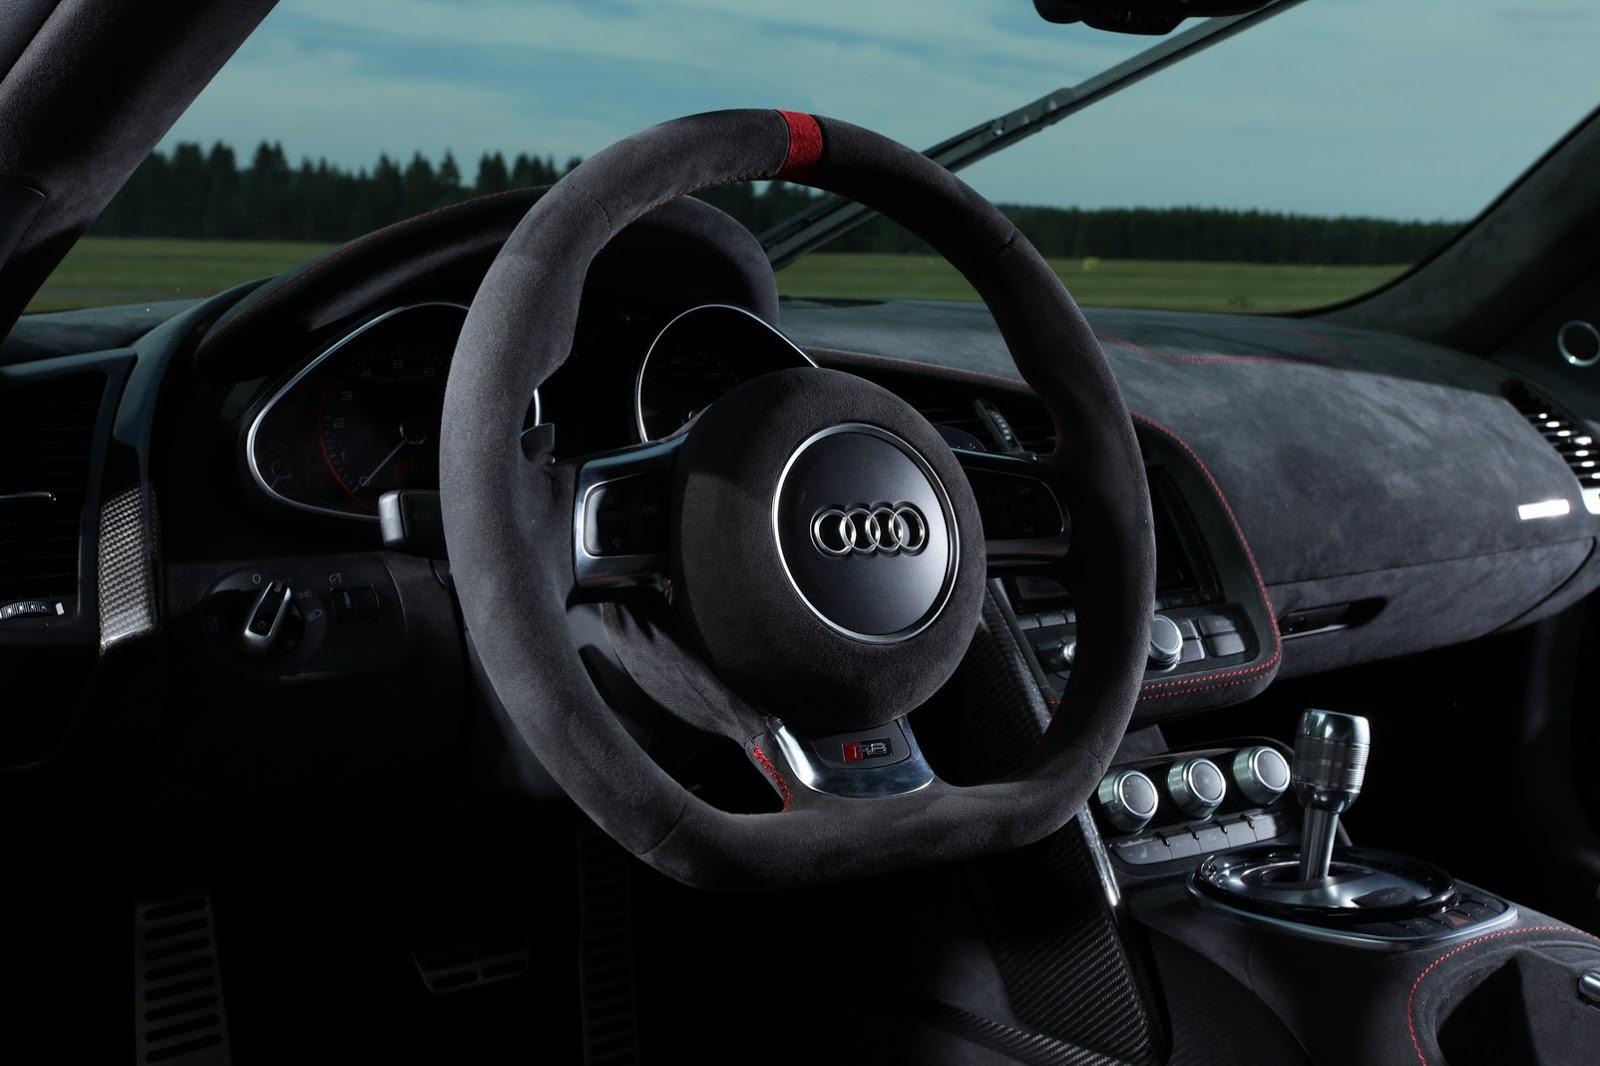 Audi-R8-Recon-MR8-18.jpg